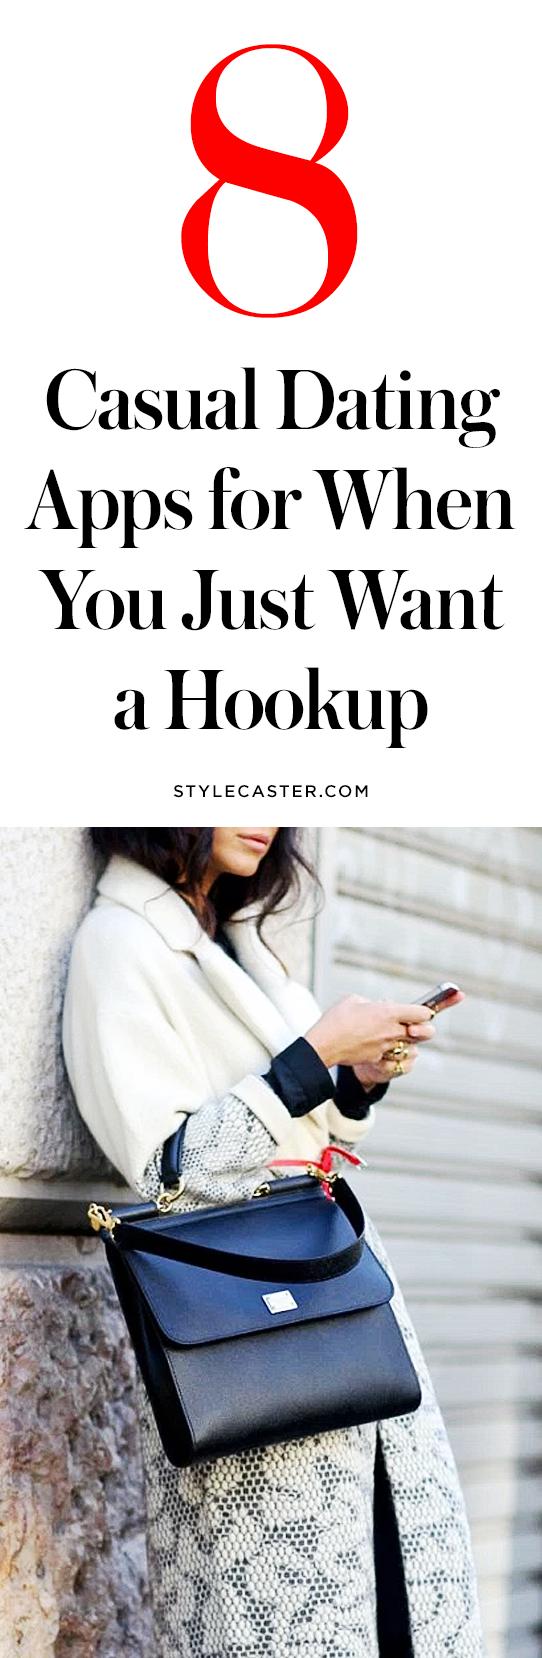 Kostenlose casual dating app